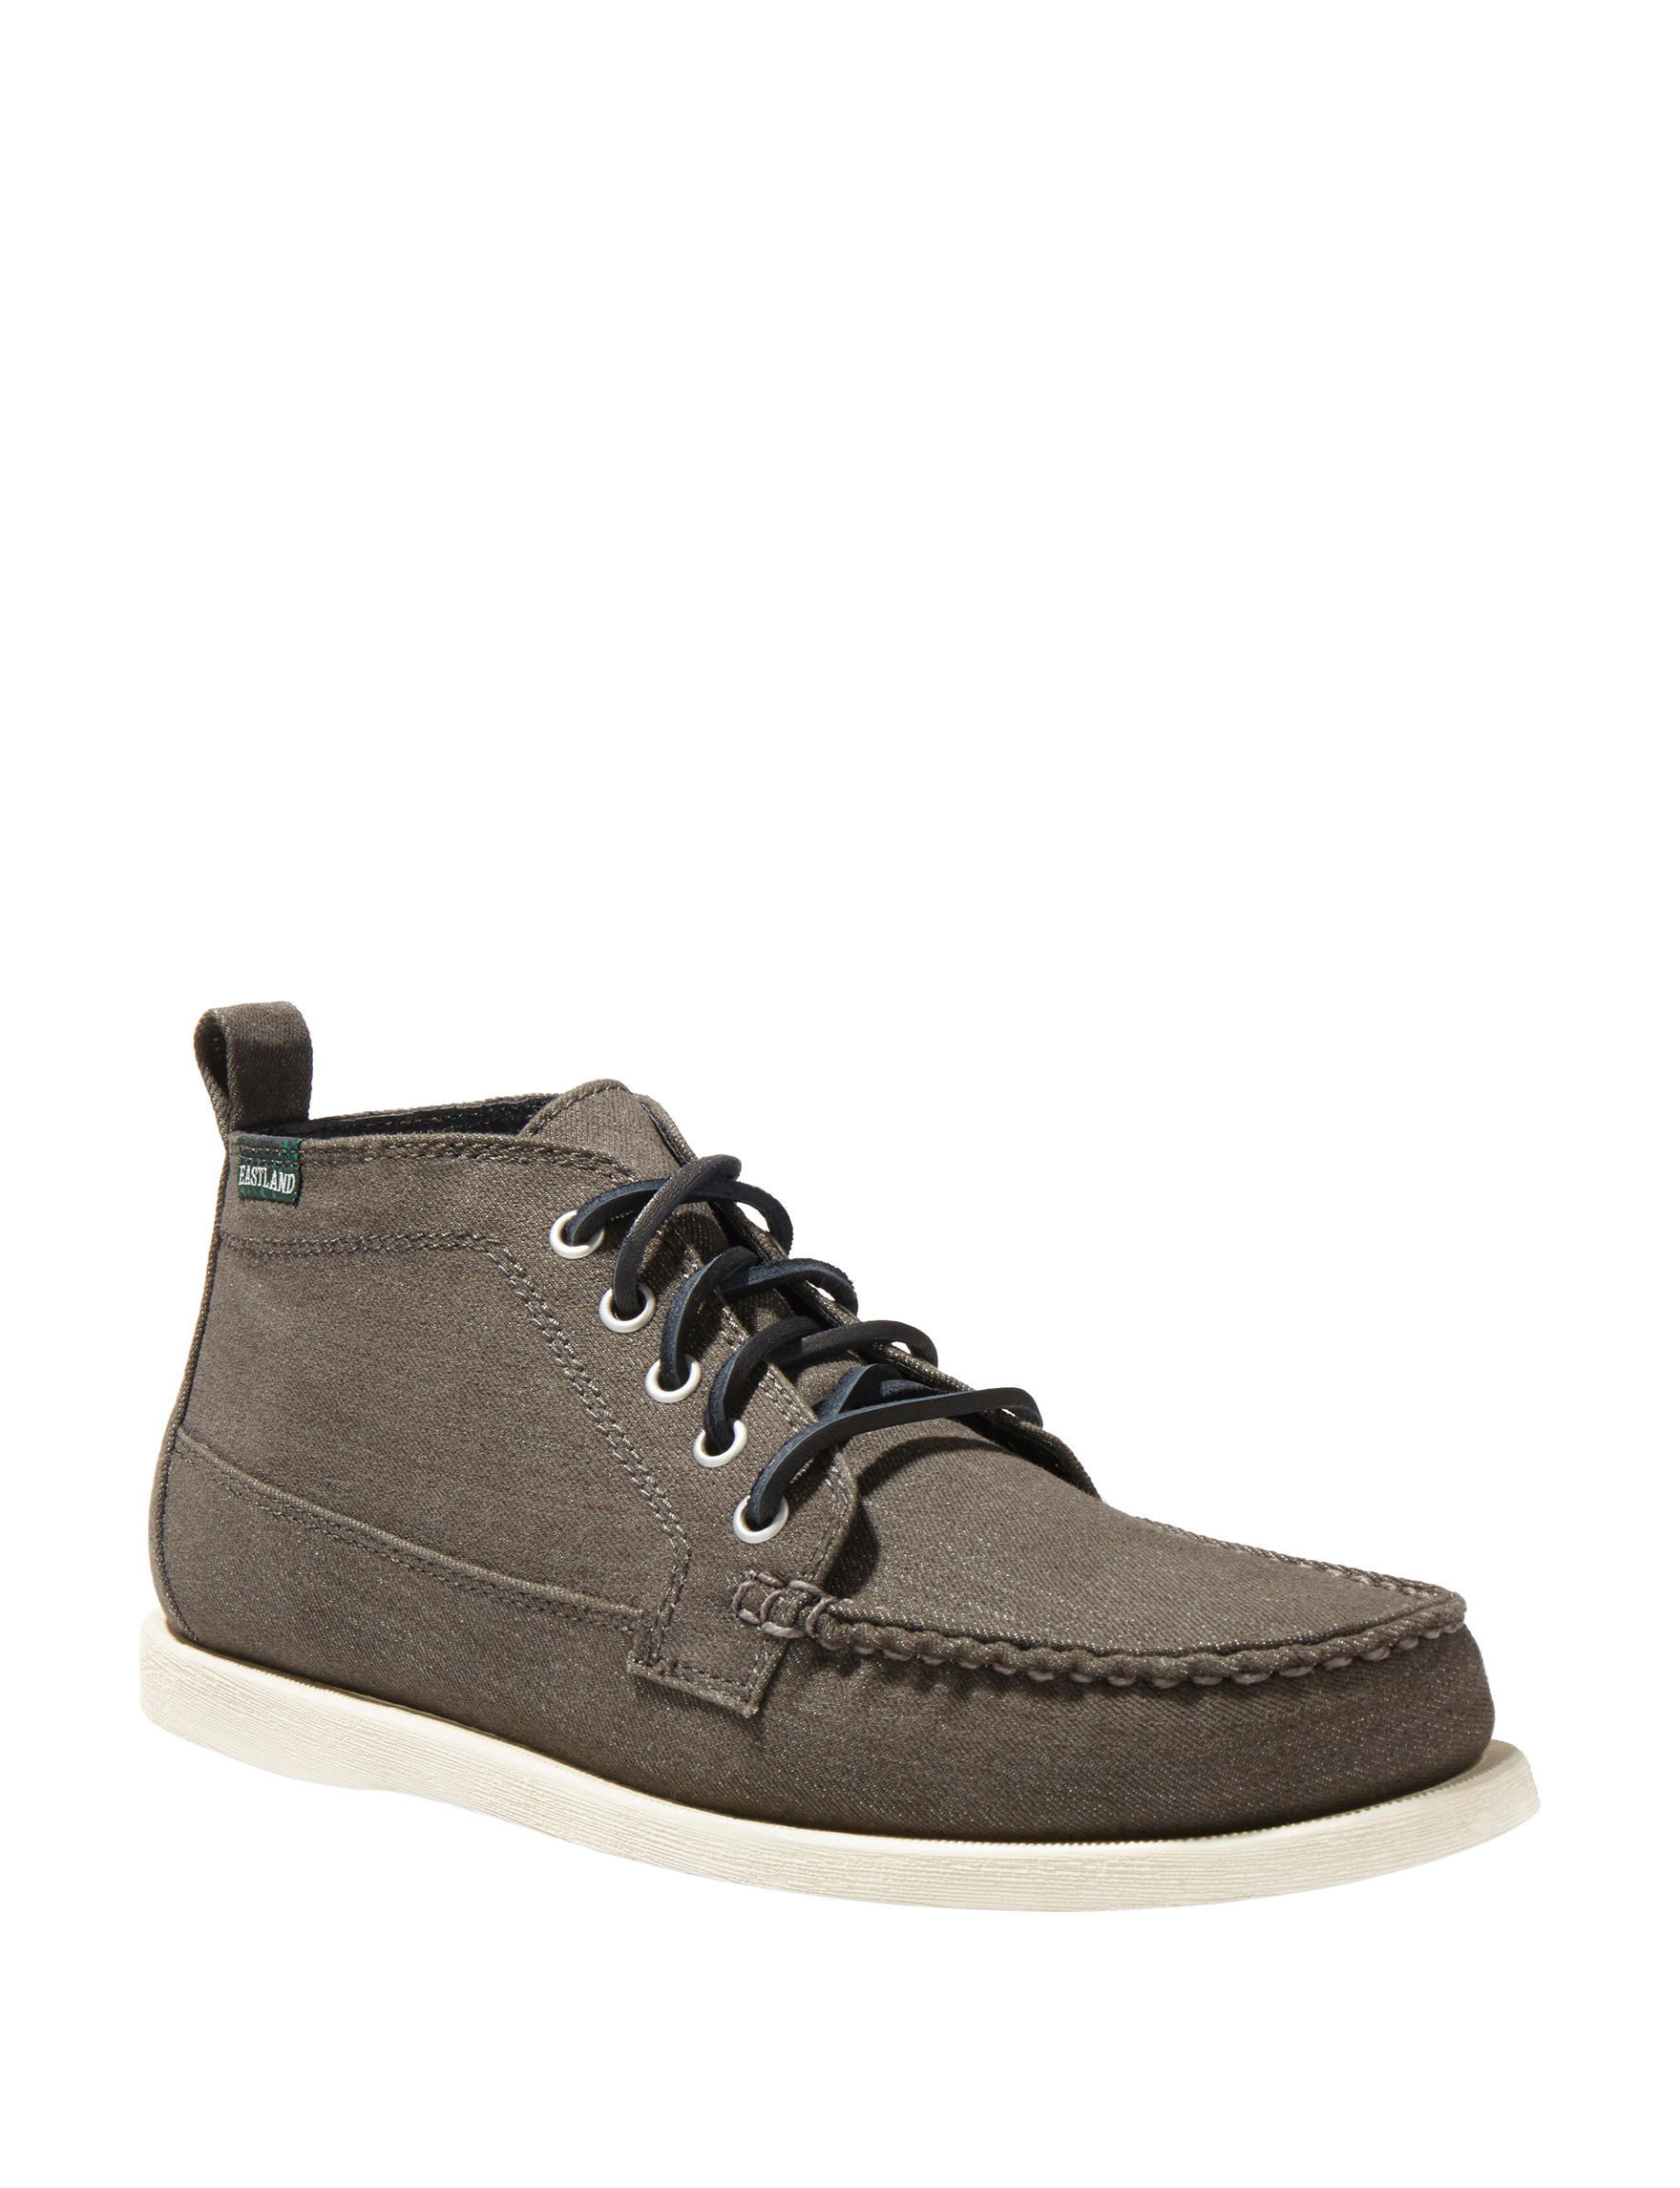 Eastland Black Chukka Boots